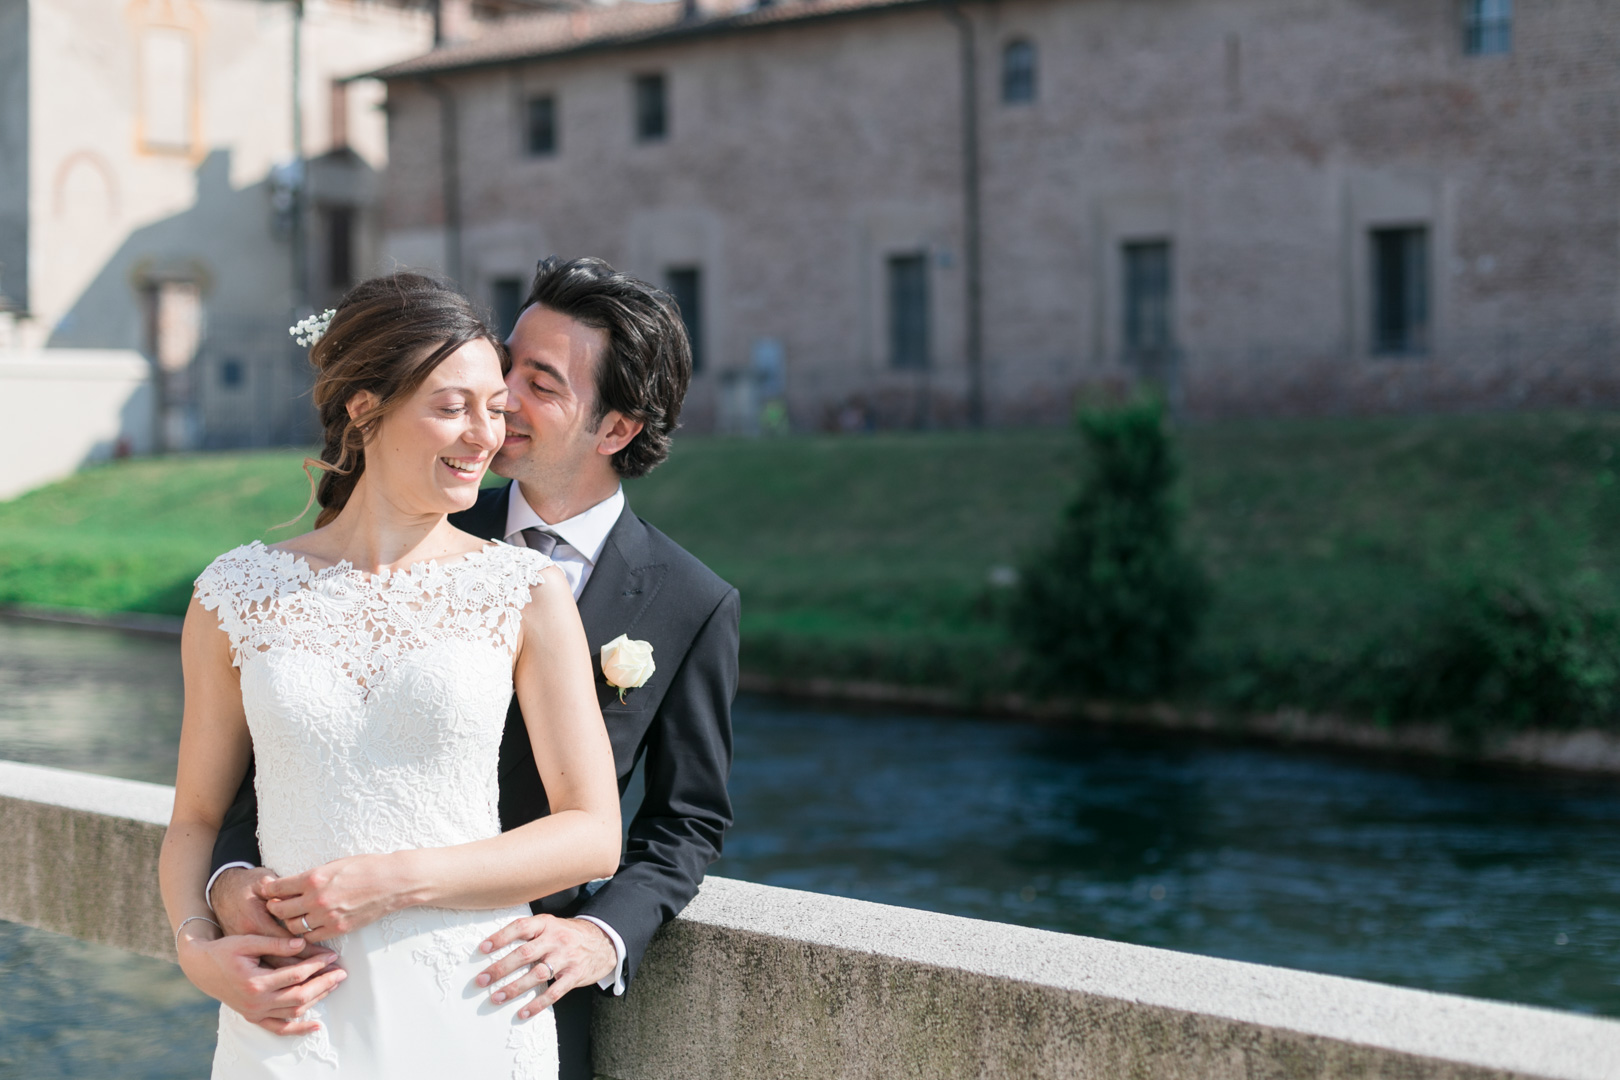 Andreas_Pinacci_Wedding_Photographer-20.